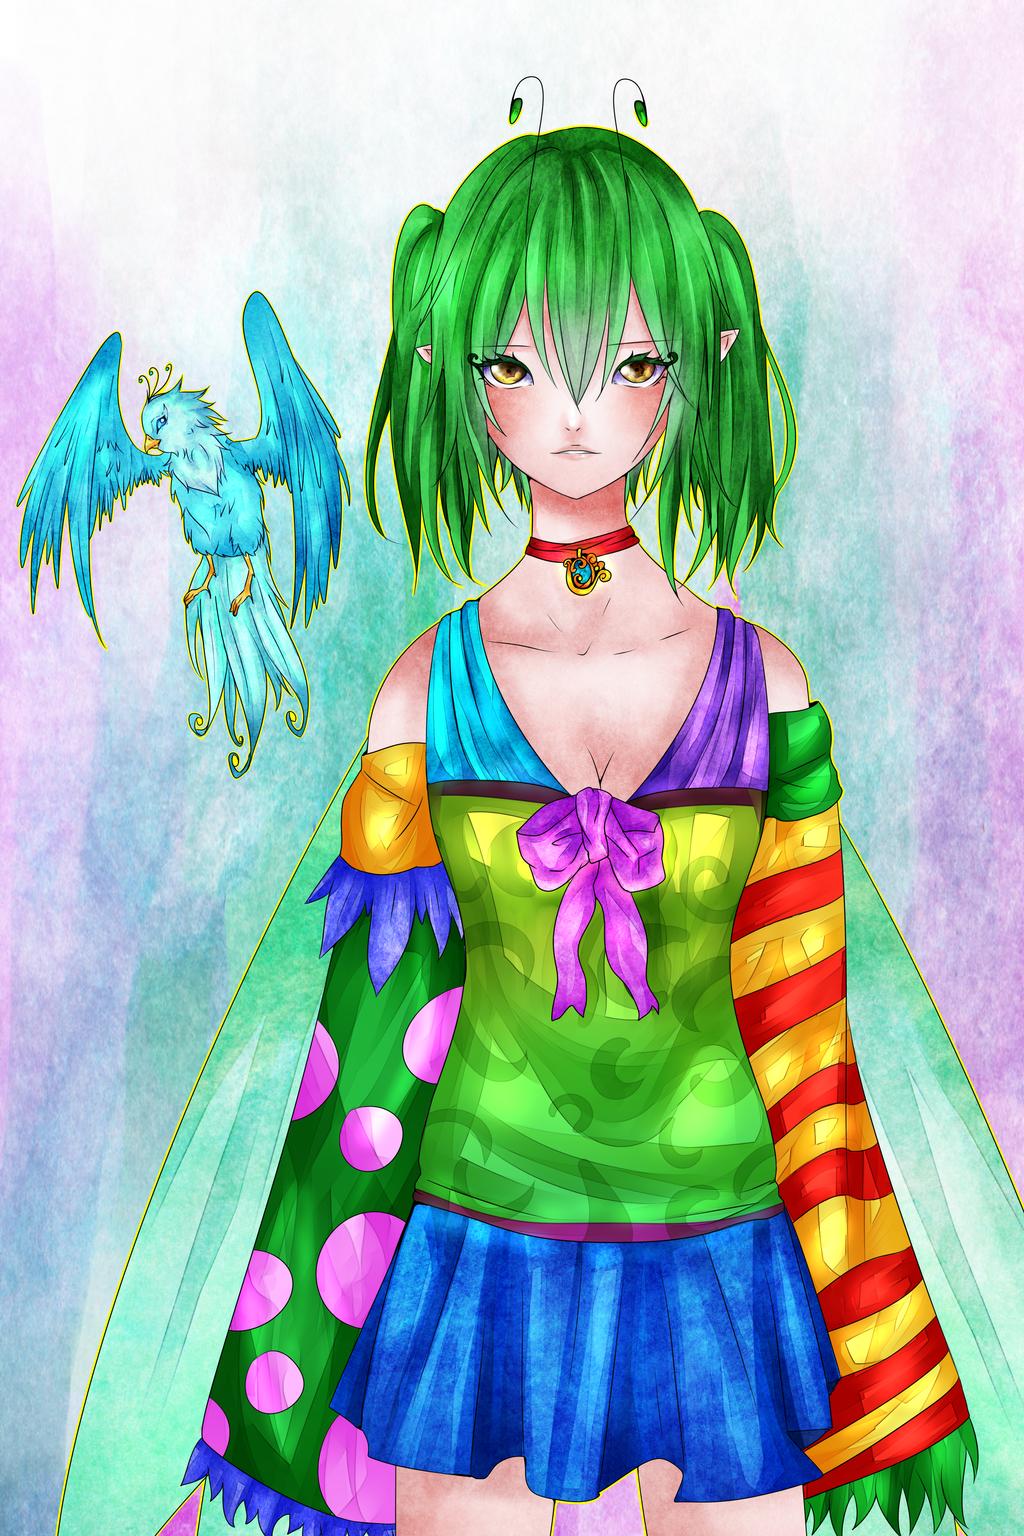 LunA: Younger!Sol by Dariuki